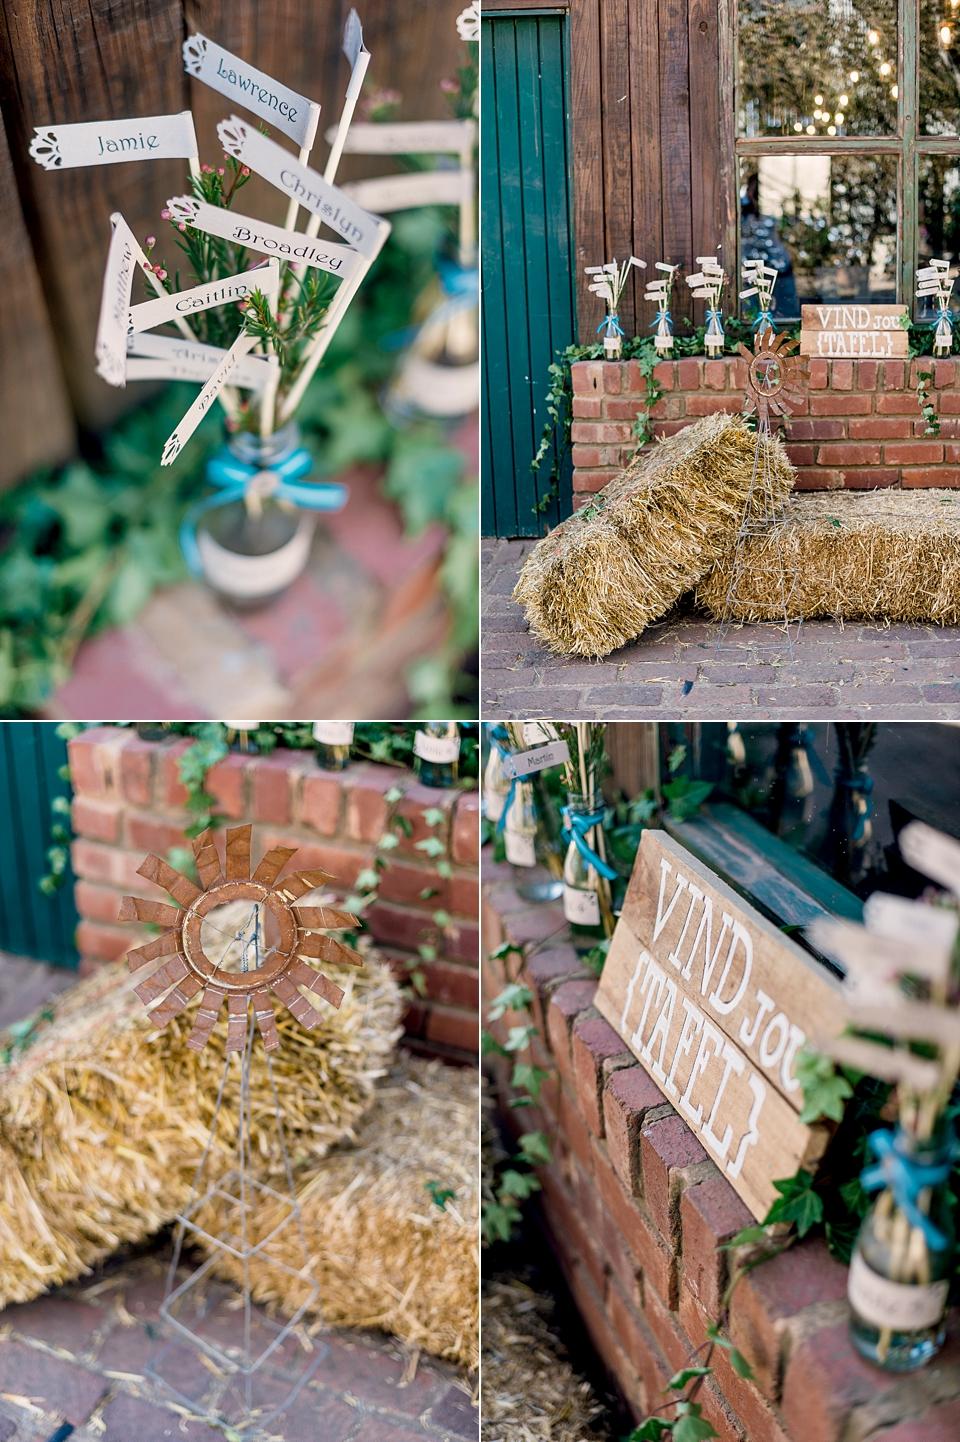 RyanParker_WeddingPhotographer_Pretoria_RosemaryHill_Gauteng_P&R_DSC_6287_RyanParker_FineArtPhotographer_CapeTown_CopyRight_.jpg